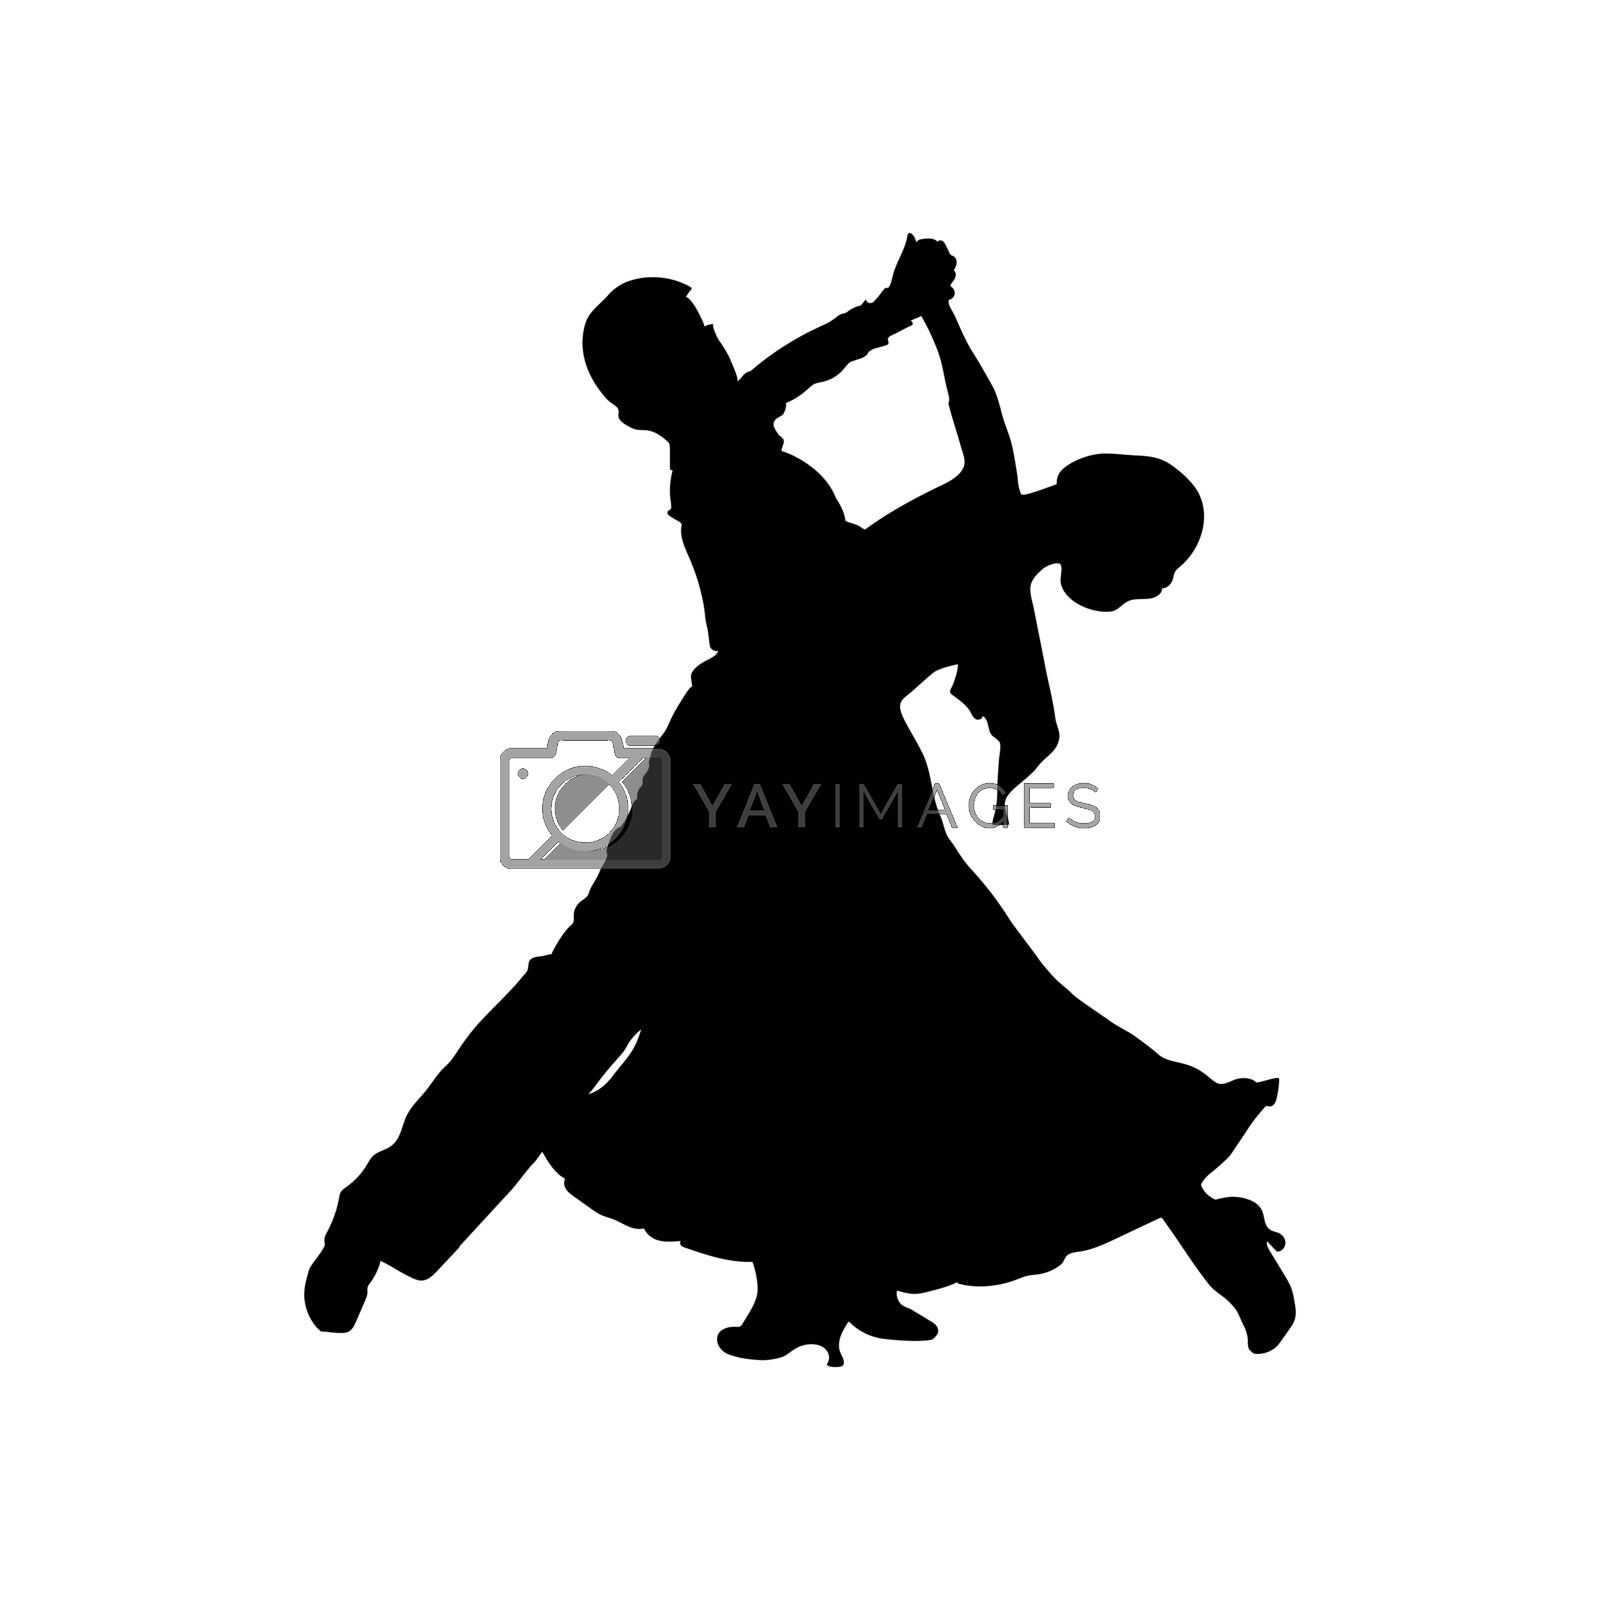 Couple dancing tango, silhouette of couple dancers